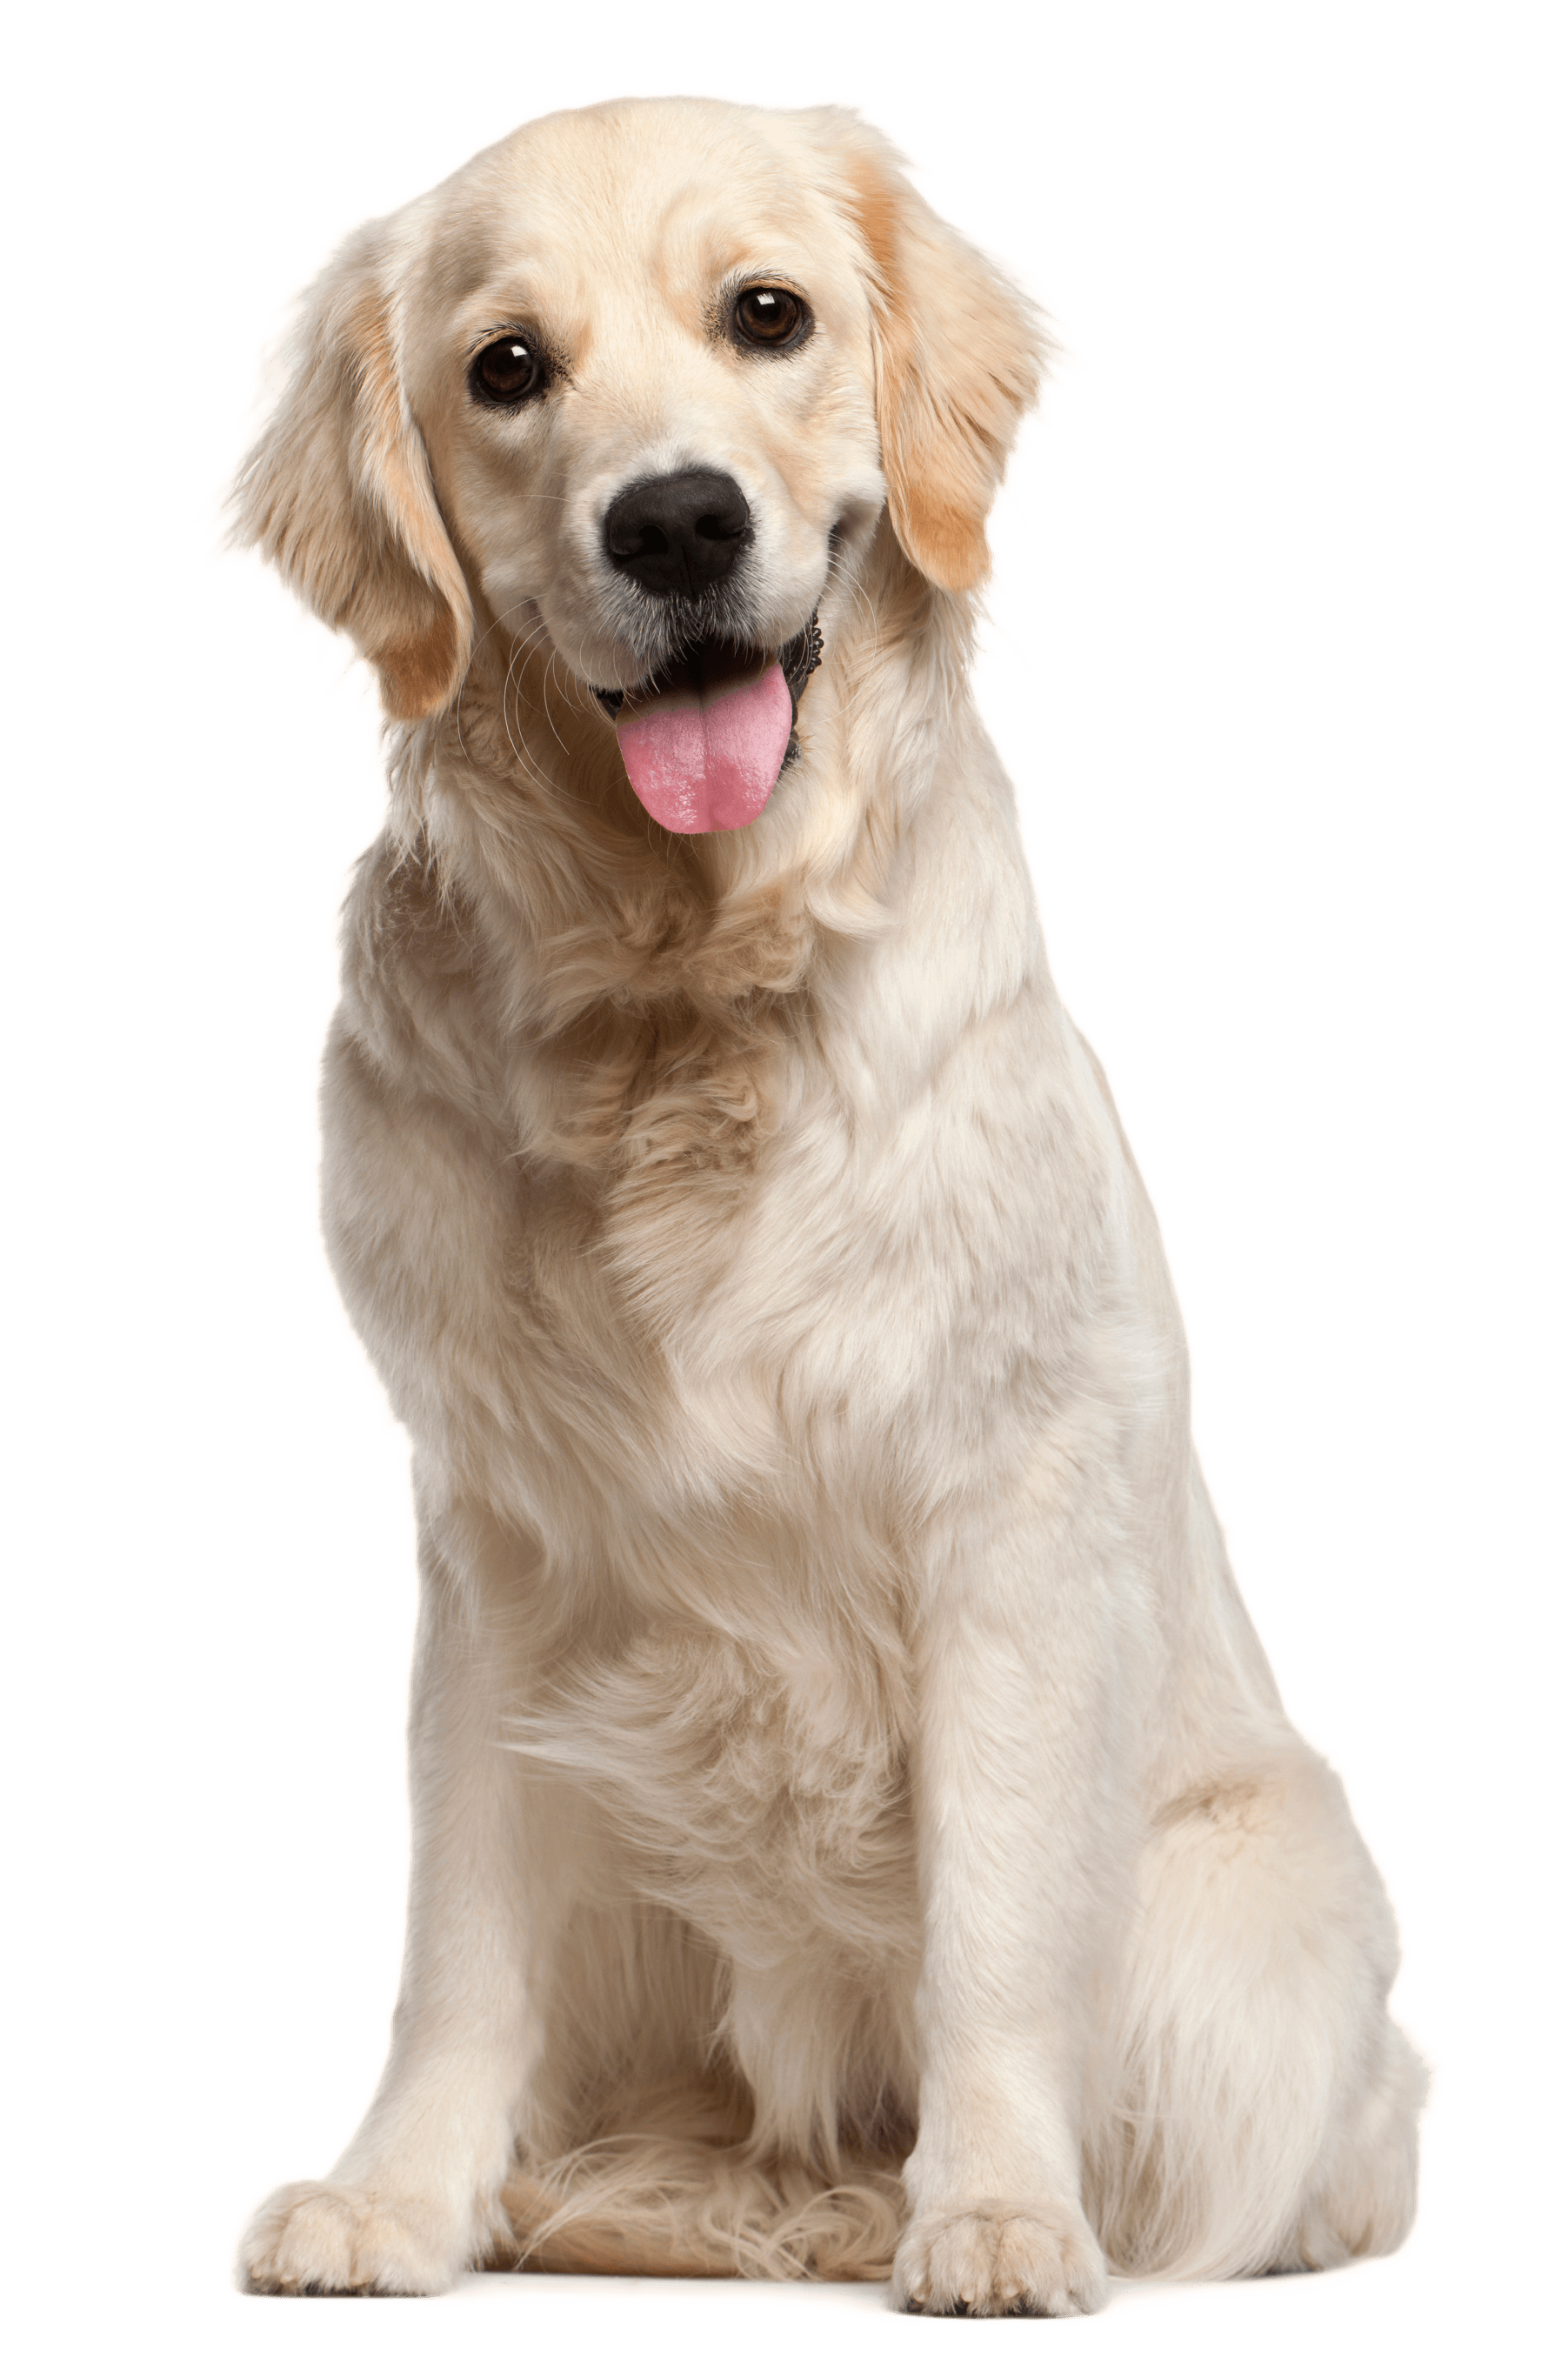 Dog PNG - 8875